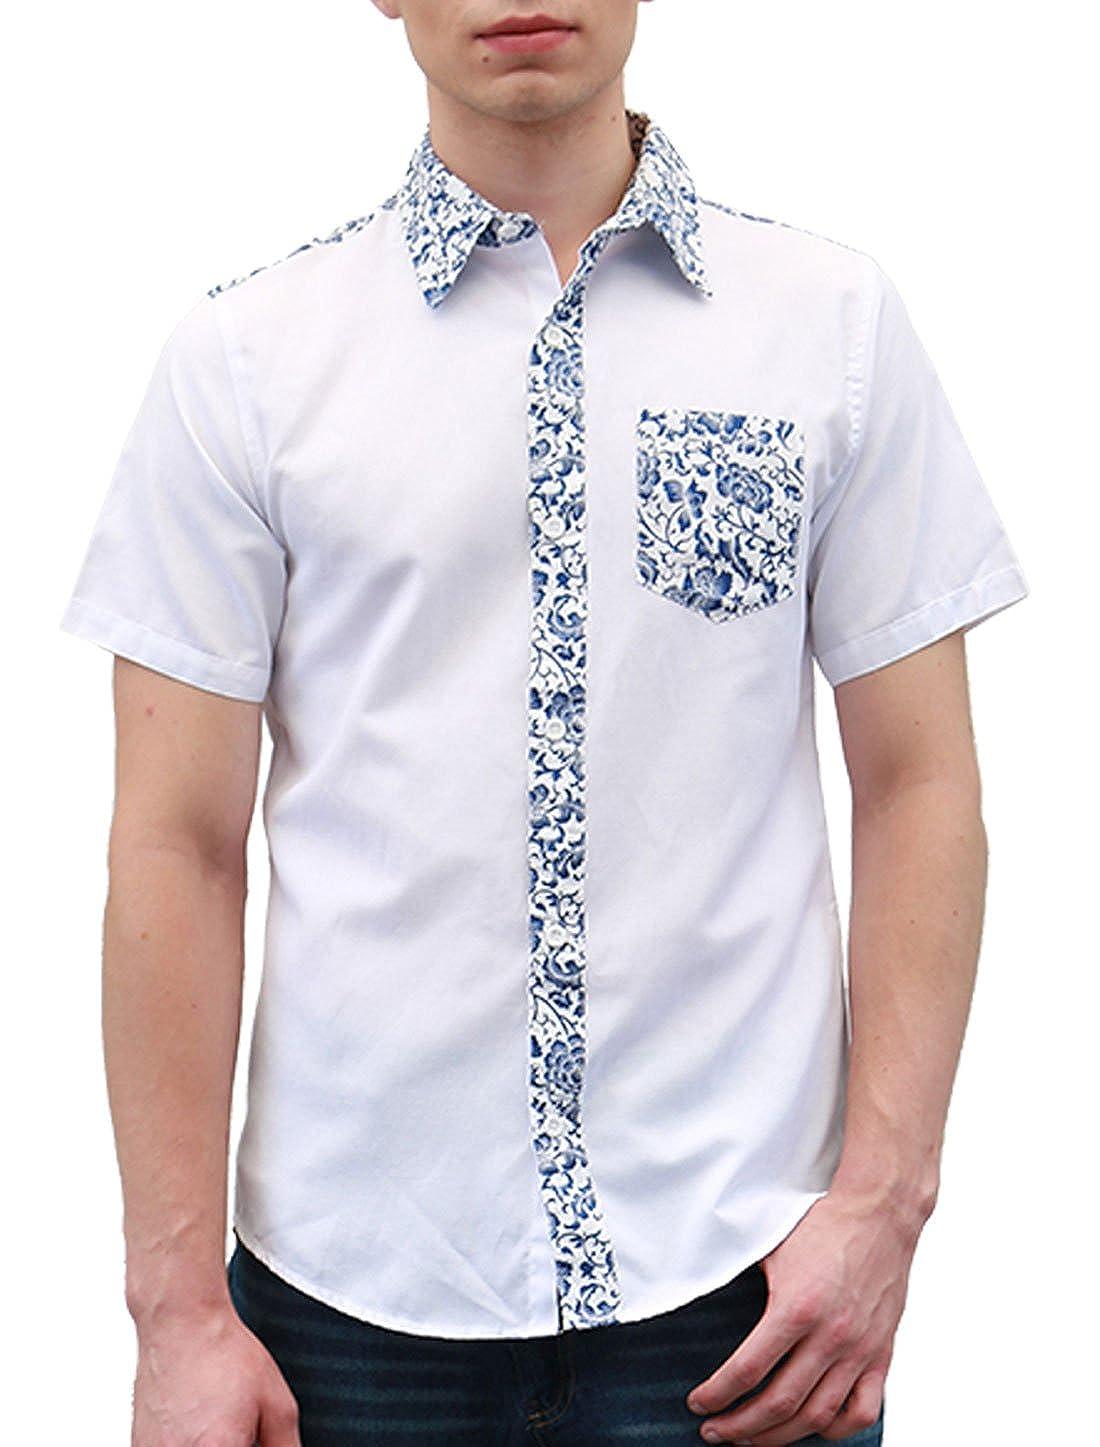 e7c47999 uxcell Men Summer Floral Print Pocket Short Sleeve Button Down Hawaiian  Shirt at Amazon Men's Clothing store: